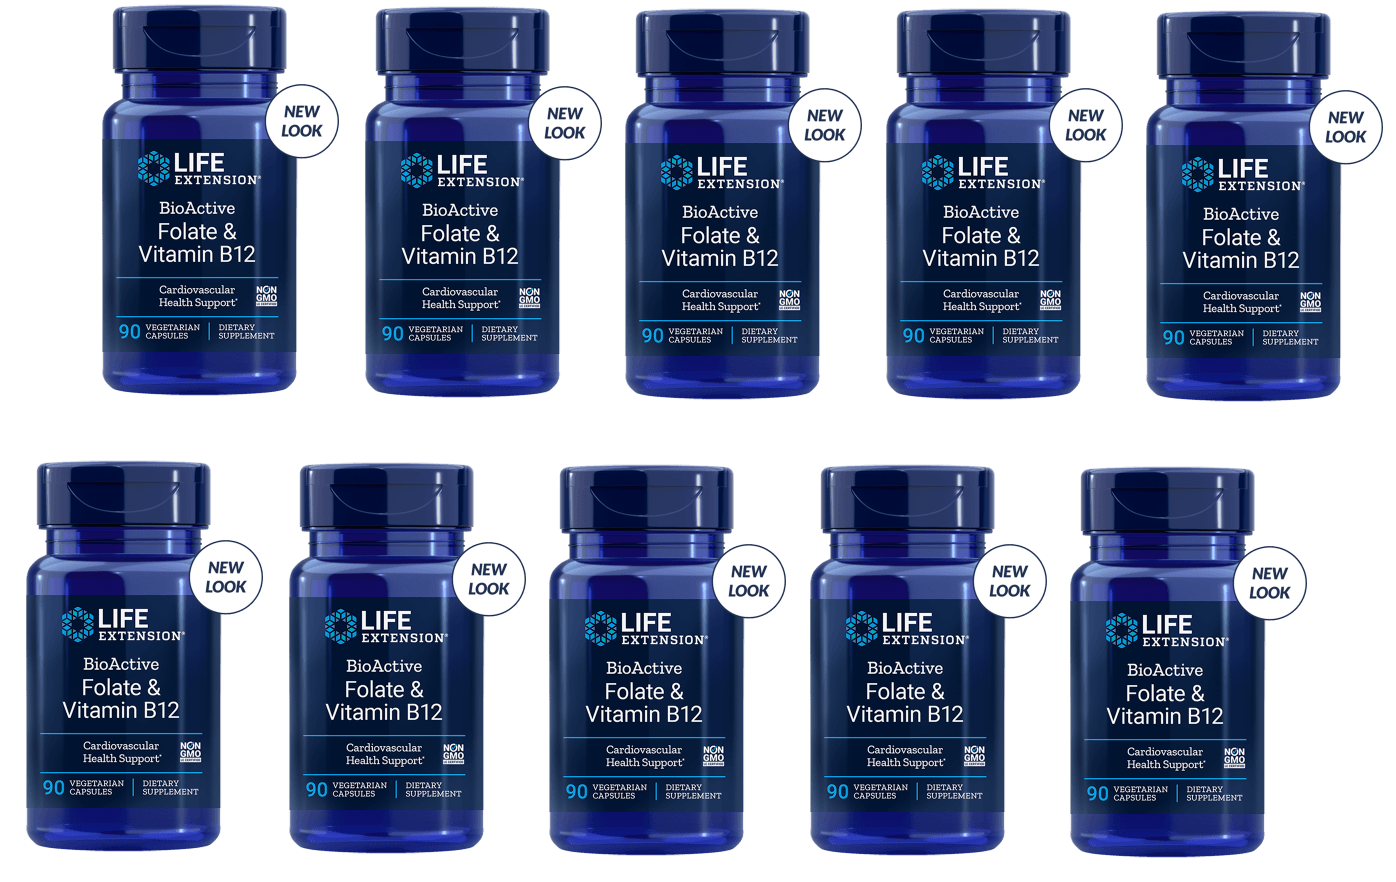 Life Extension Bioactive Folate & Vitamin B12, 90 Vegetarian Capsules, 10-pack